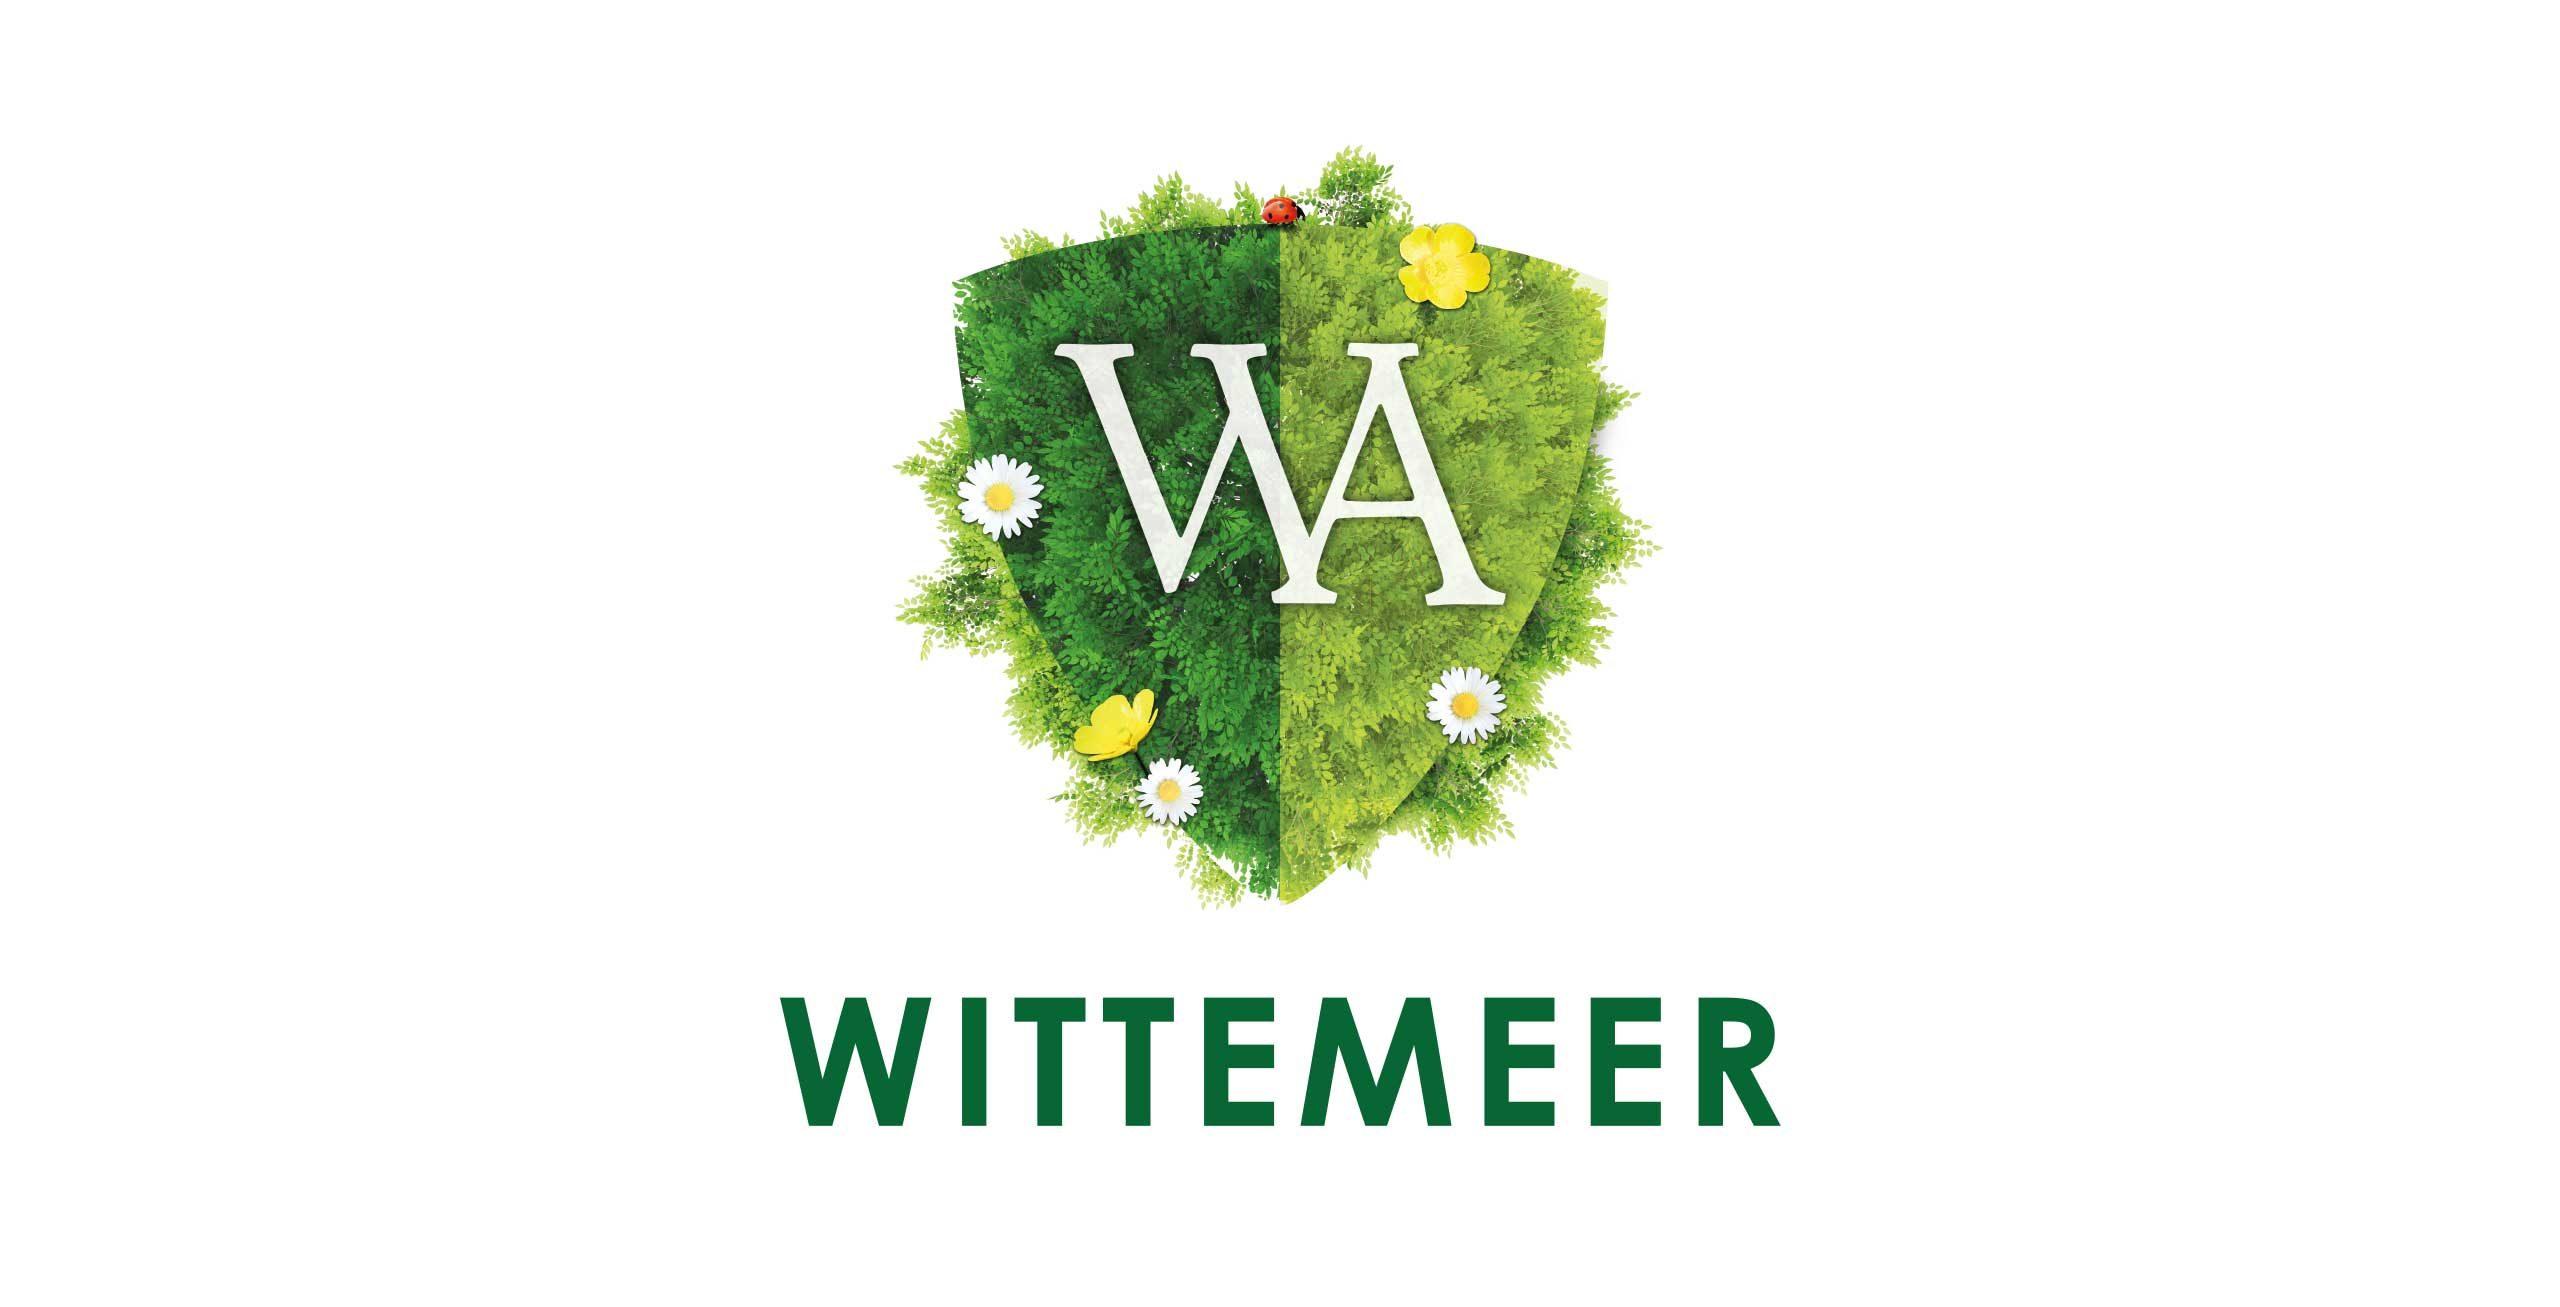 LR-wittemeer-logos-2560x1500